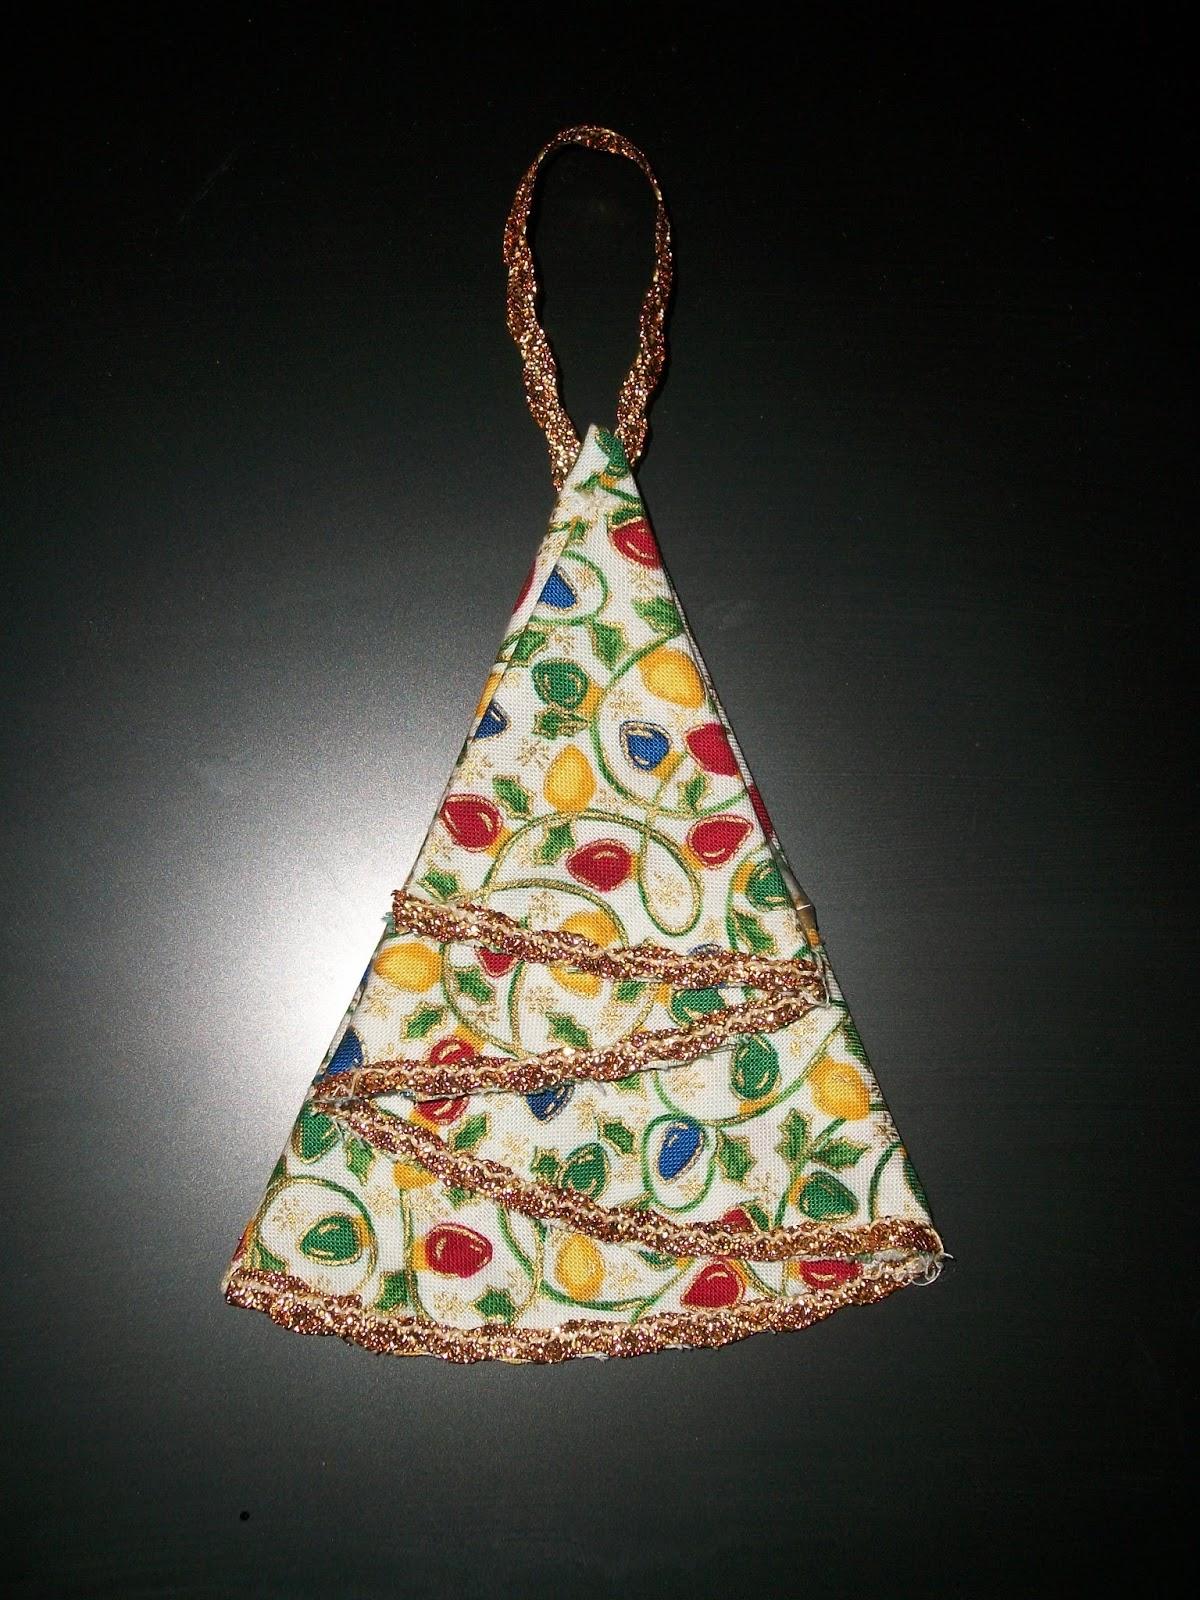 Creative Bling: Fabric Christmas Tree Ornament